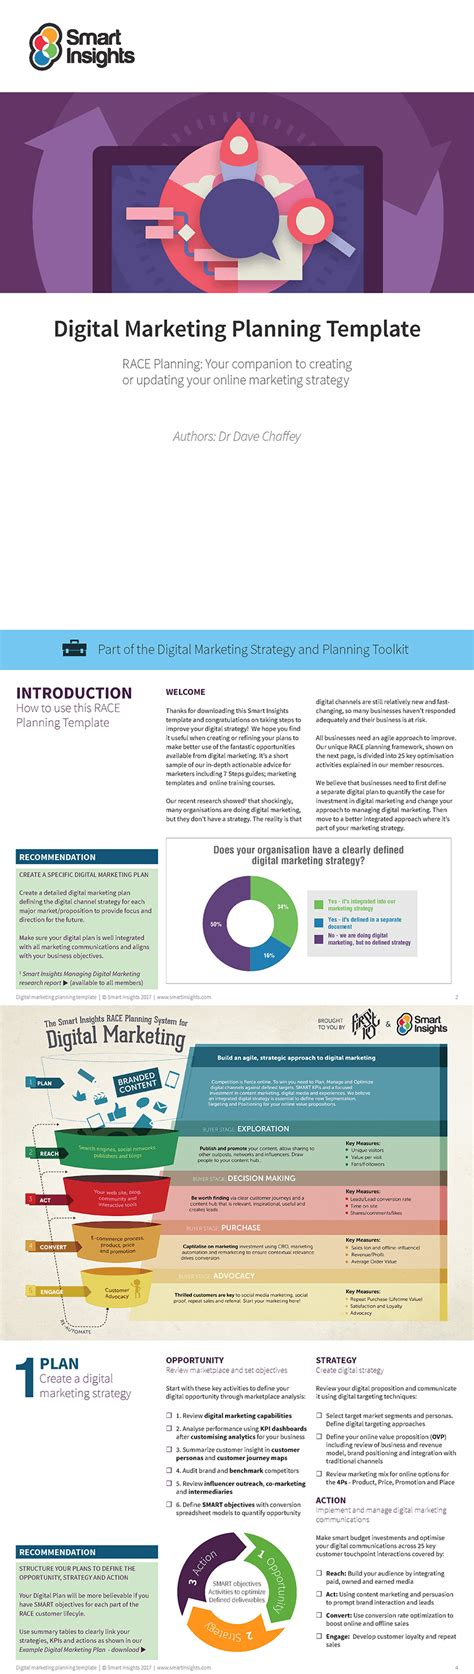 Free Digital Marketing Plan Template Smart Insights Digital Marketing Strategy Template